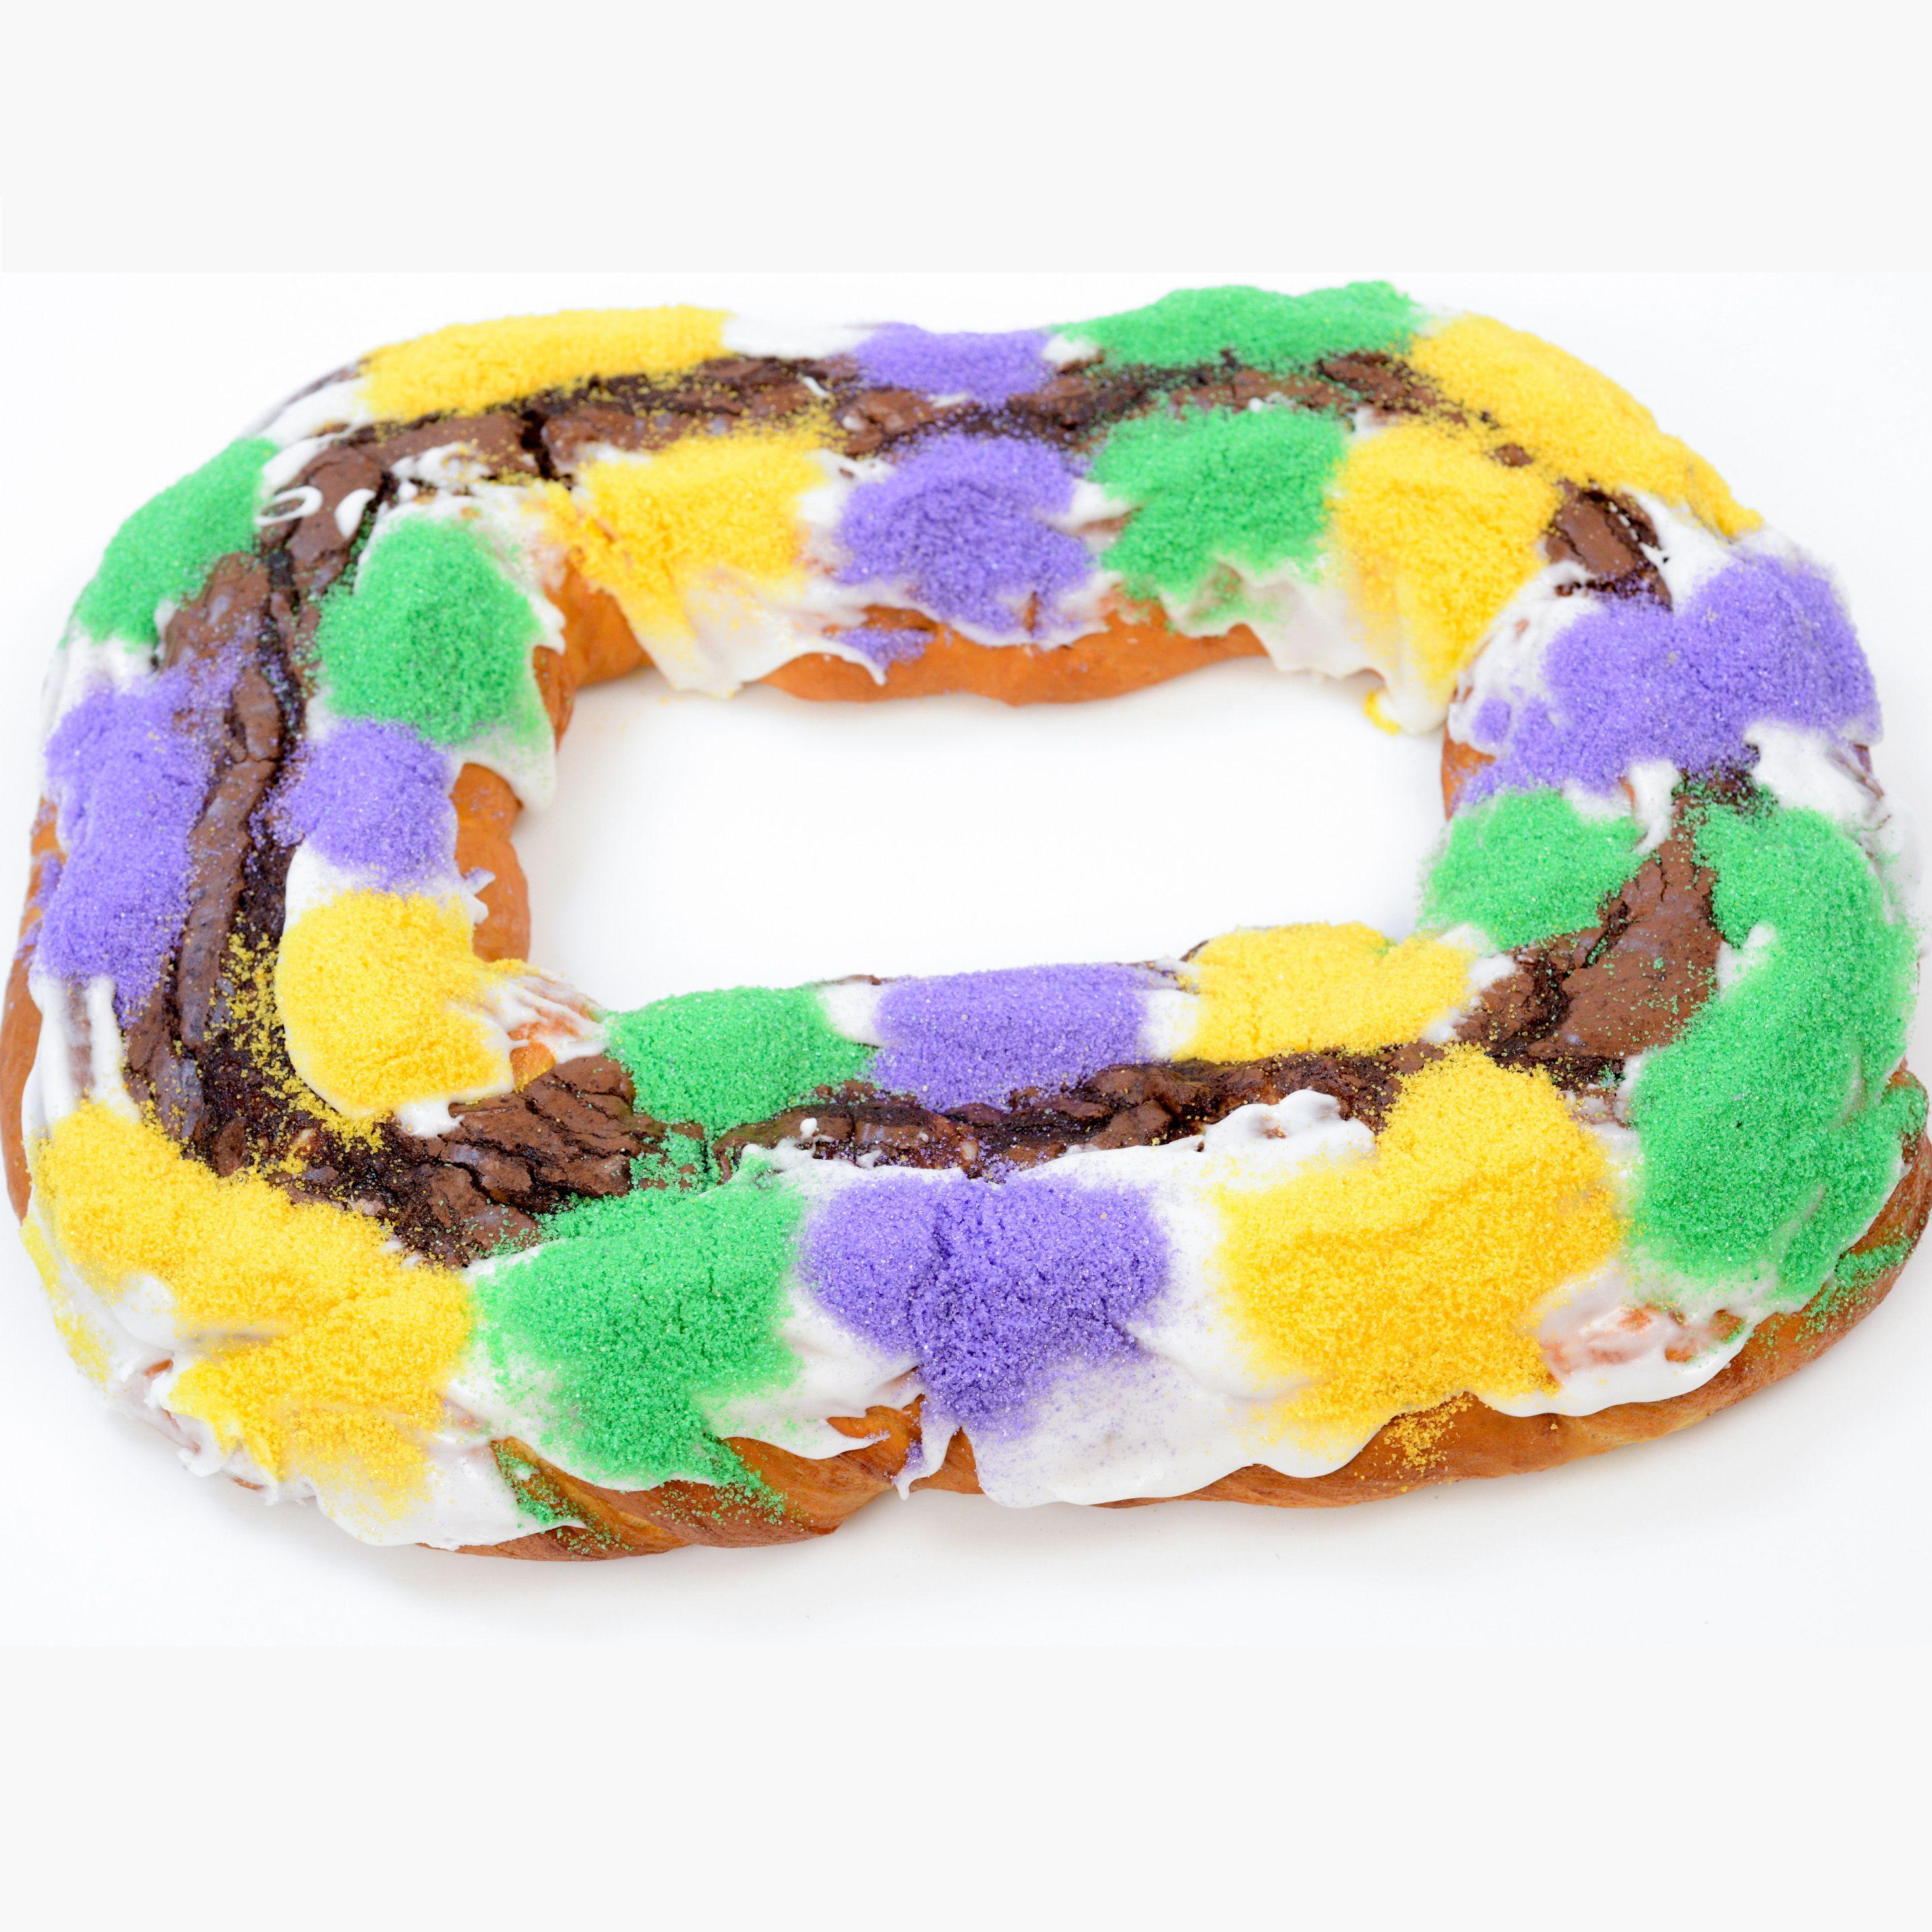 Piece of Cake King Cake Package (Haydel's)